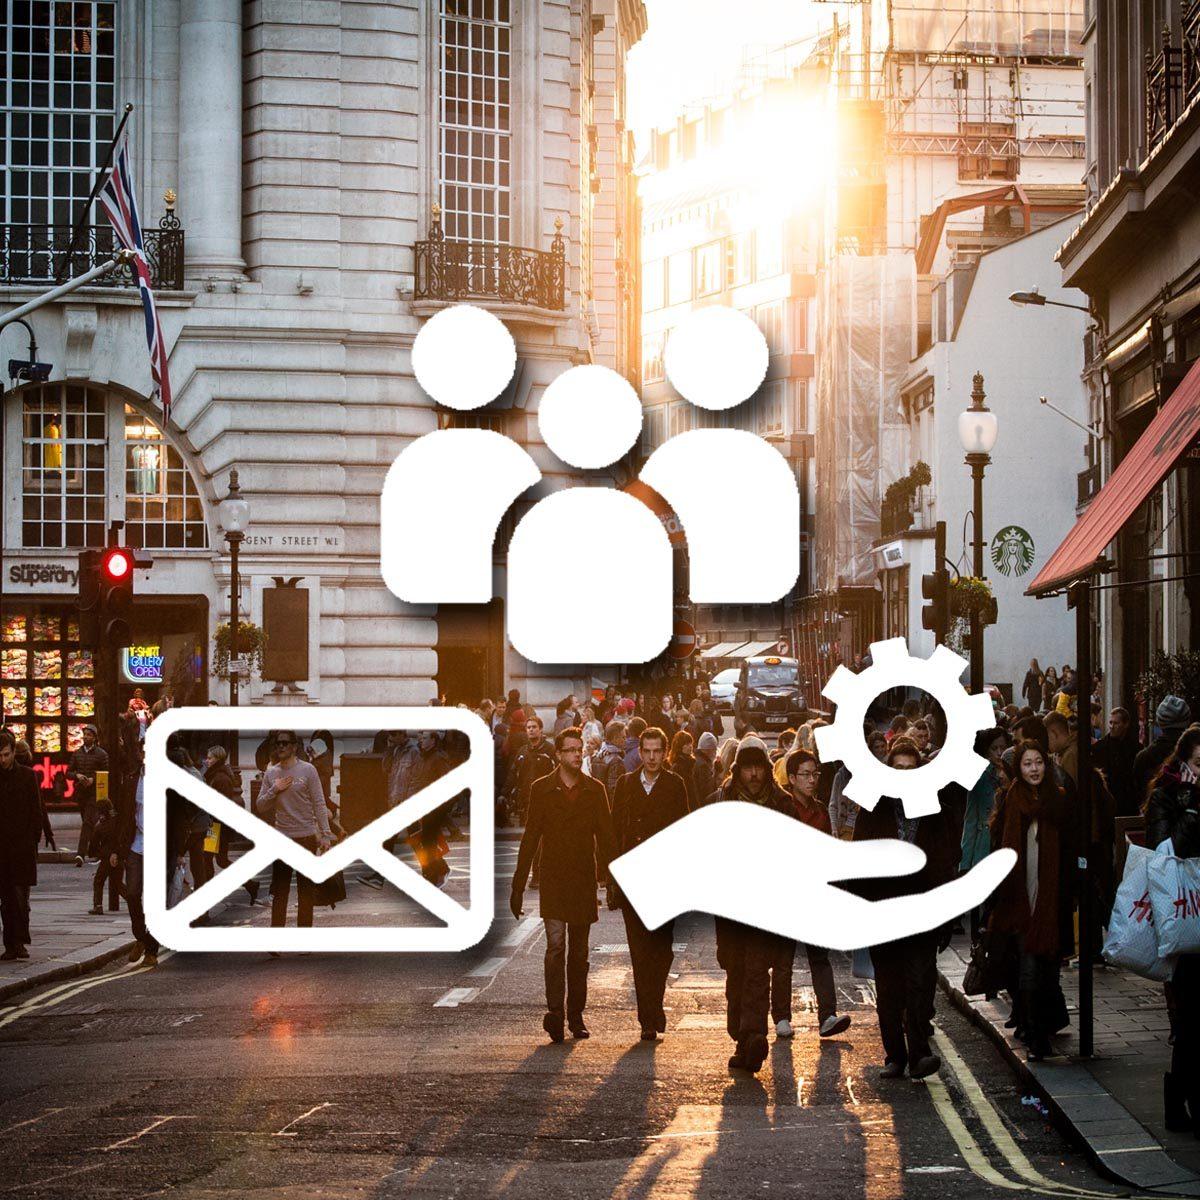 Firmen_Kundenkommunikation_Mailings_Serienbriefe